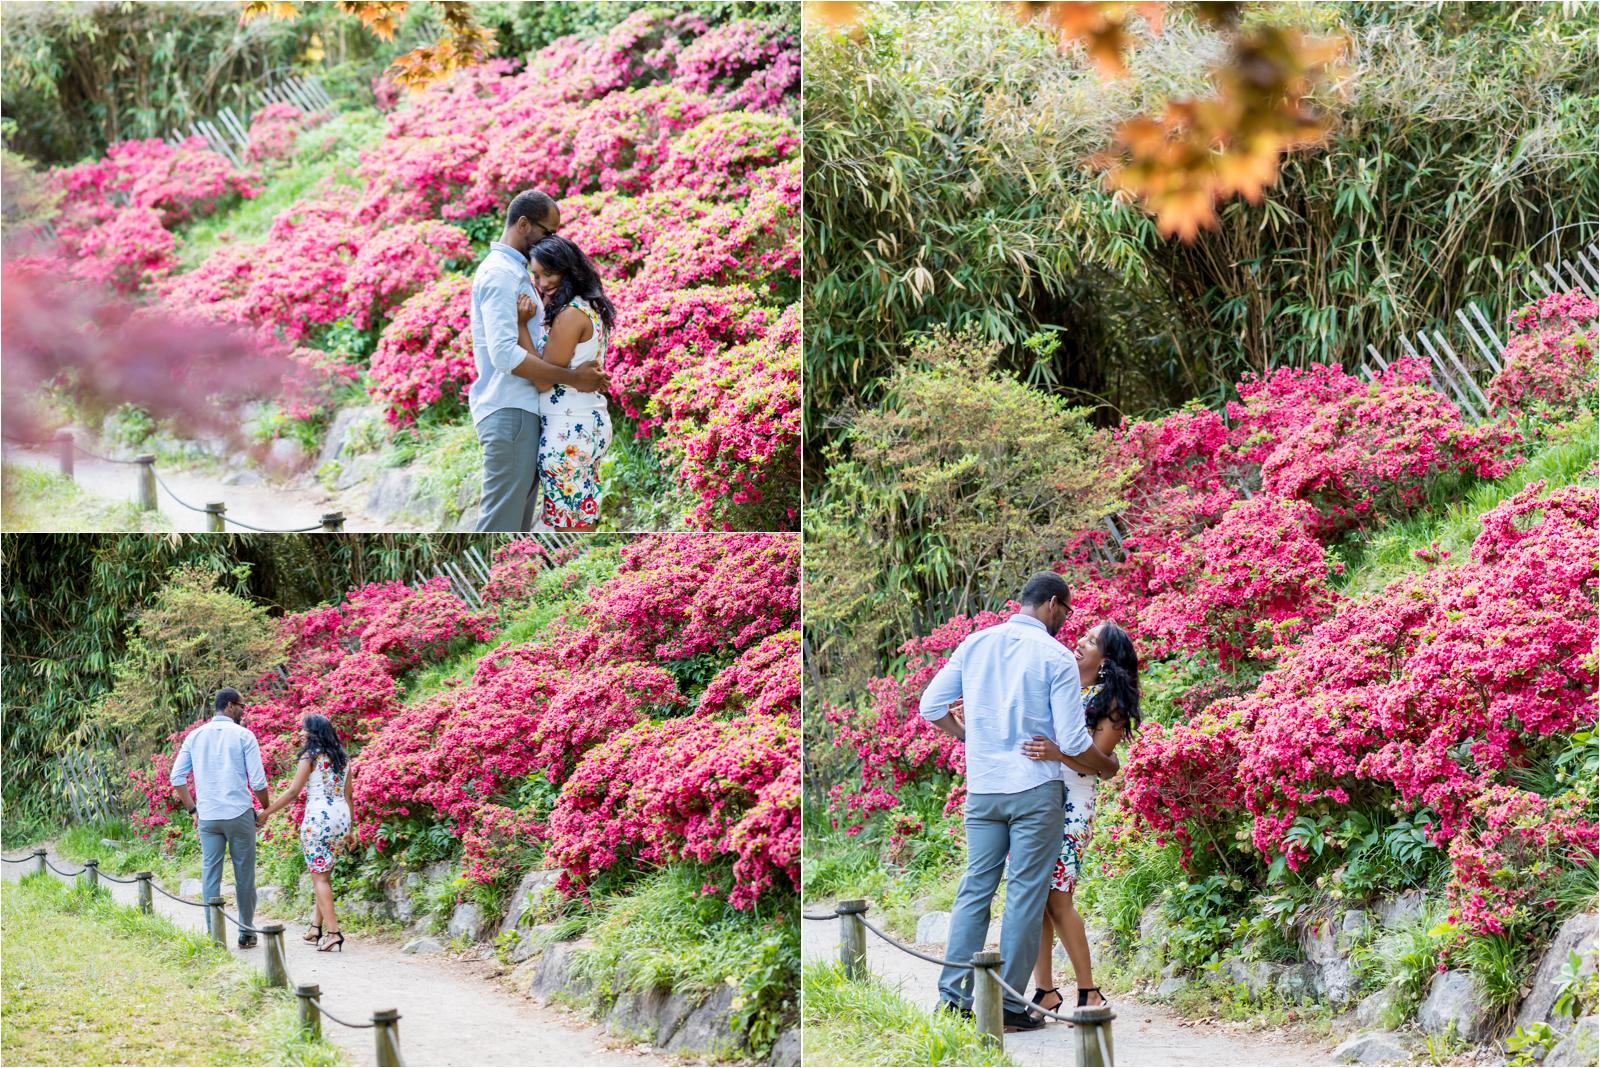 japanese-gardens-japanesegardens-engagement-images-maymont-park-italian-japanese-gardens-richmond-virginia-rva-va-focus-on-joy-photography-african-american-couple-white-dress-colorful-flowers-blue-polo-shirt-richmond